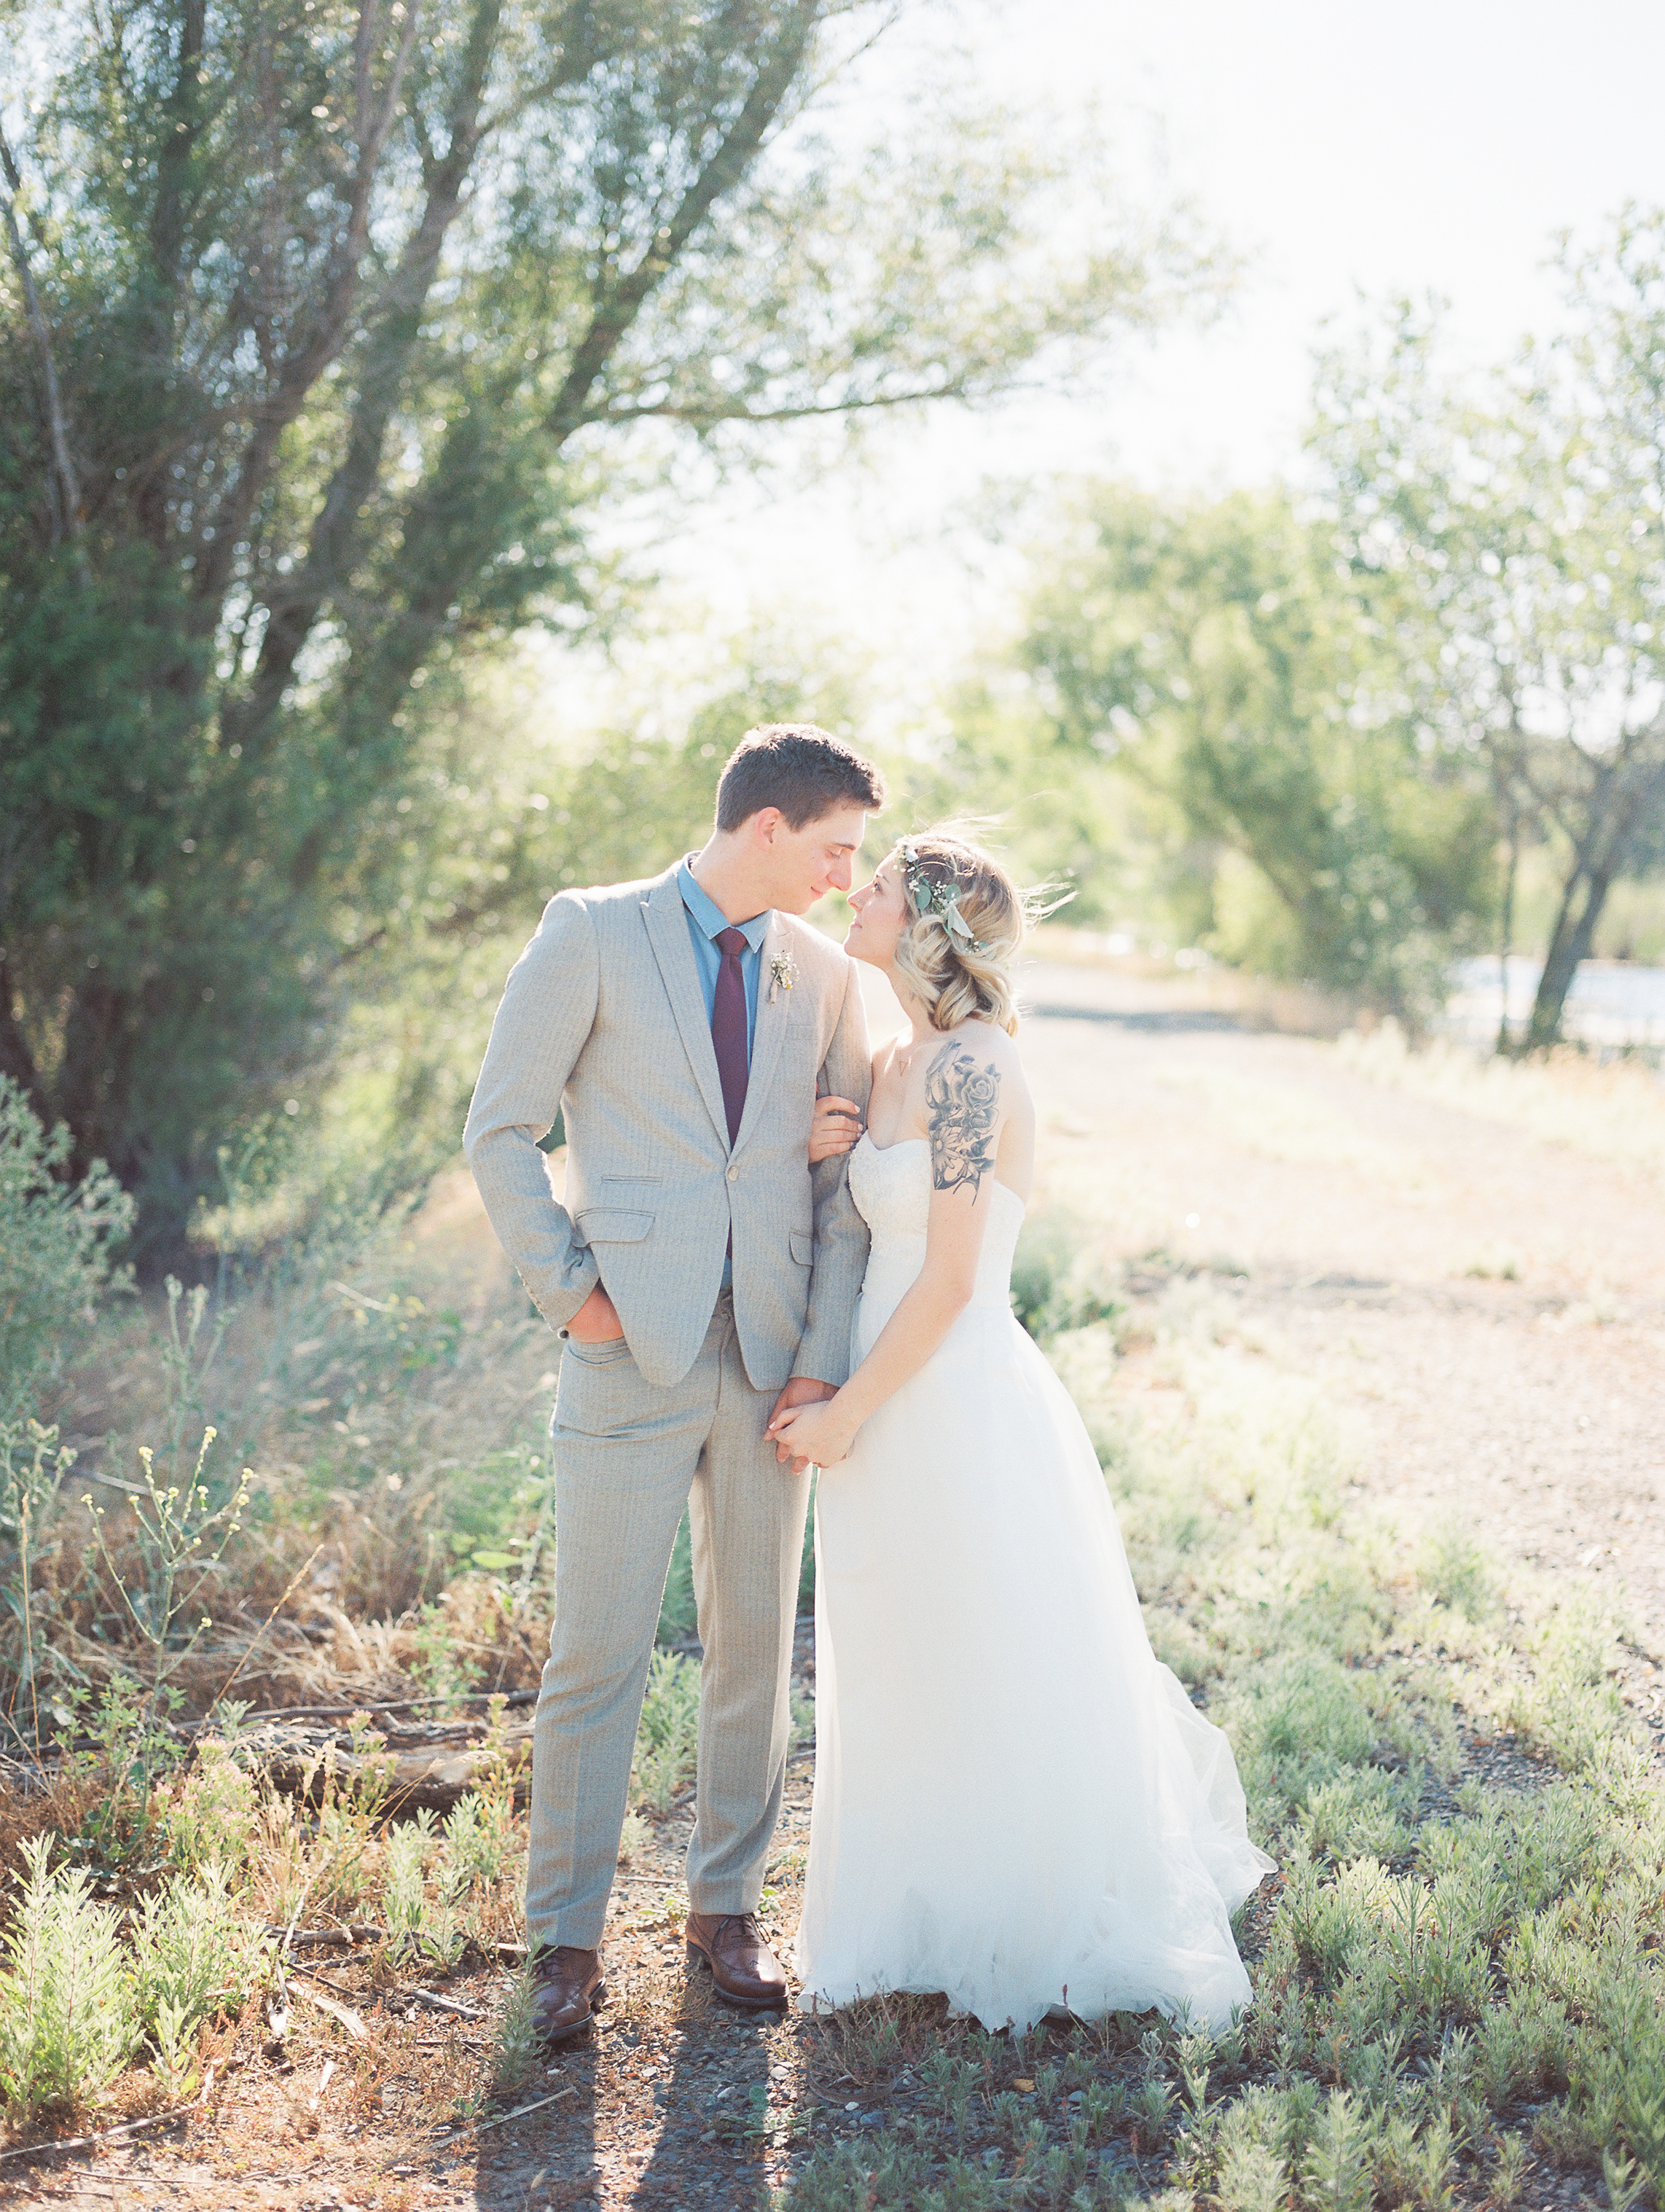 clayton+kennedy-married-filmscans-20.jpg